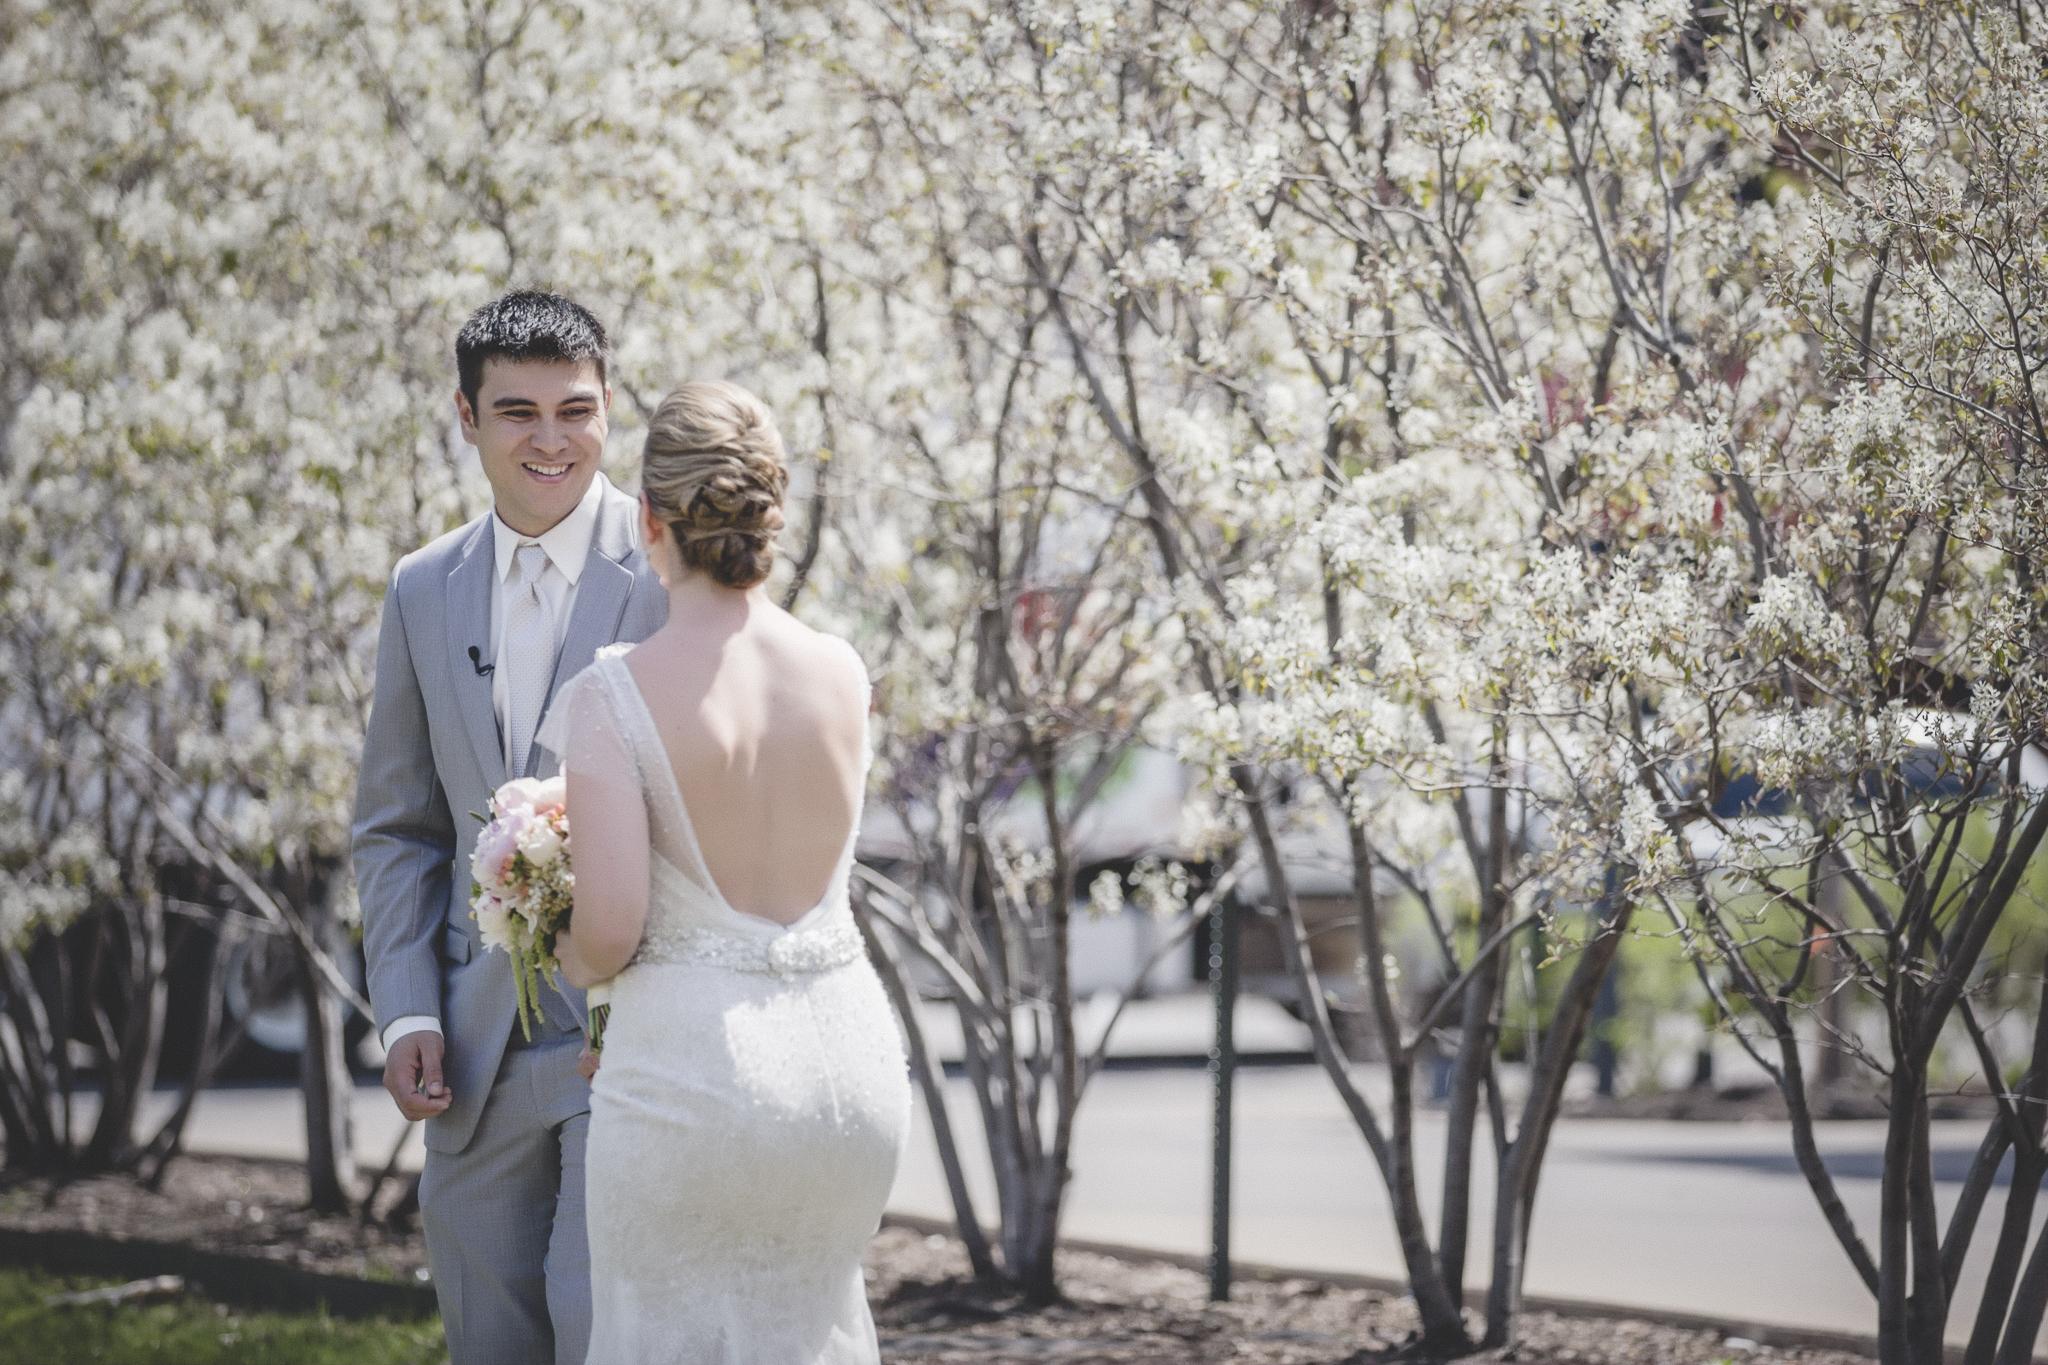 minneapolis event center wedding photographer-8.jpg